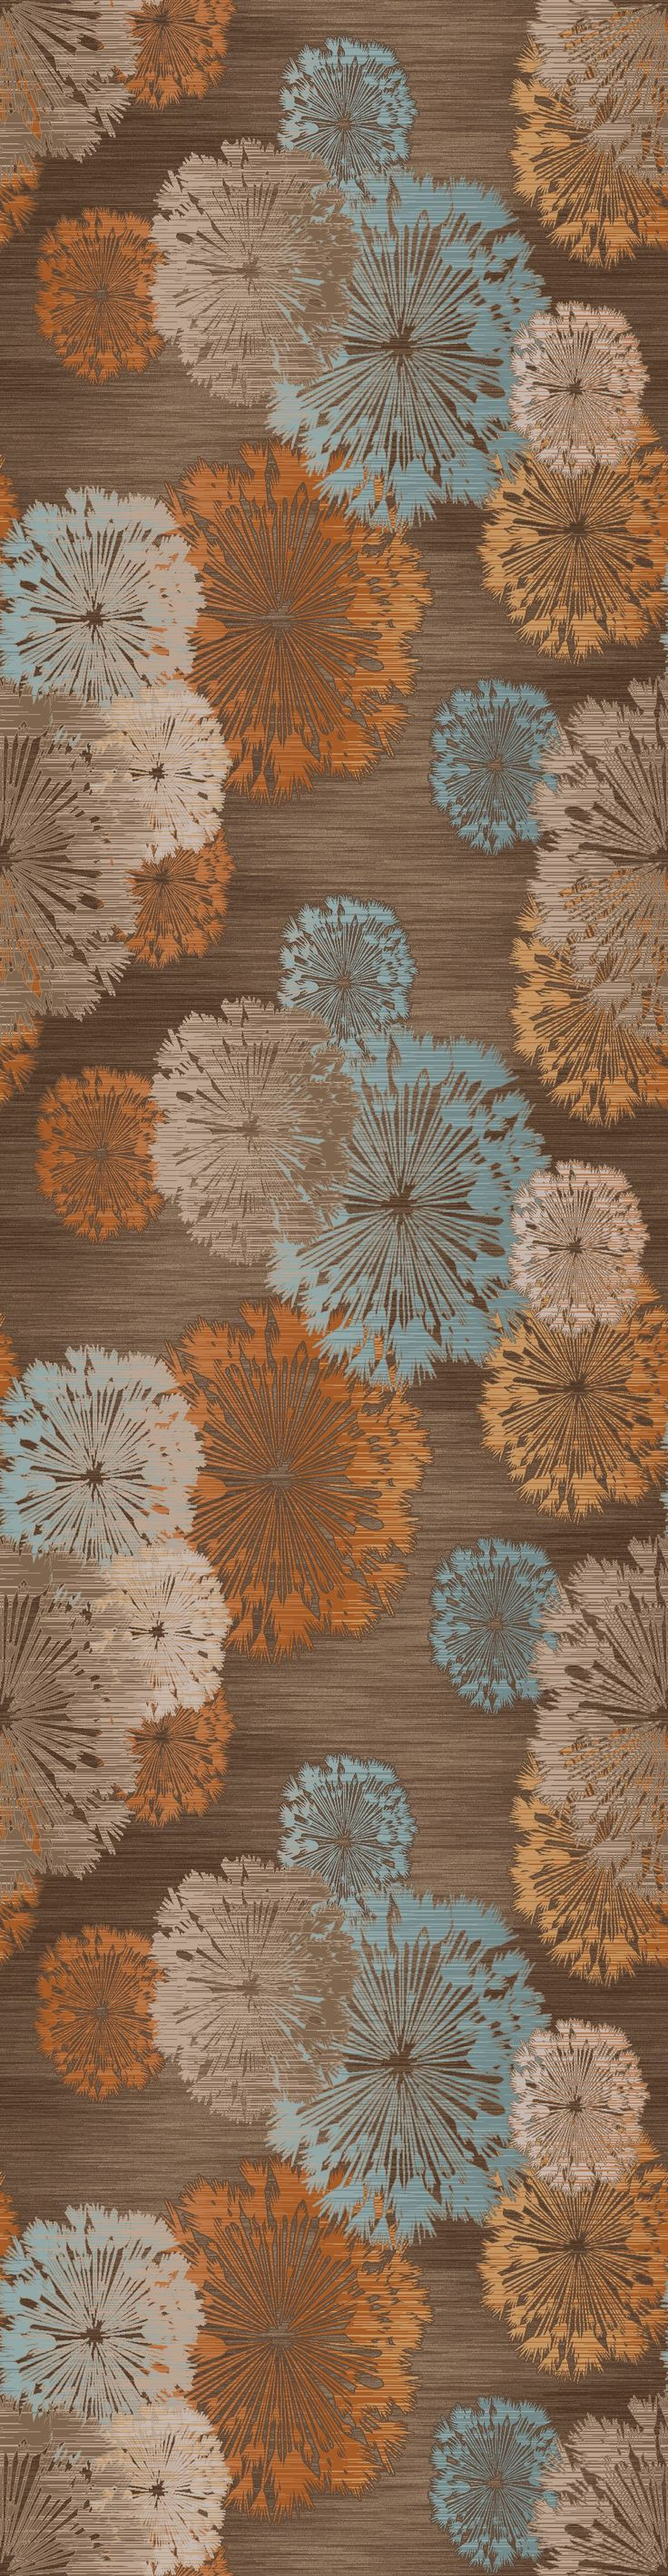 114 best FFE Carpet images on Pinterest